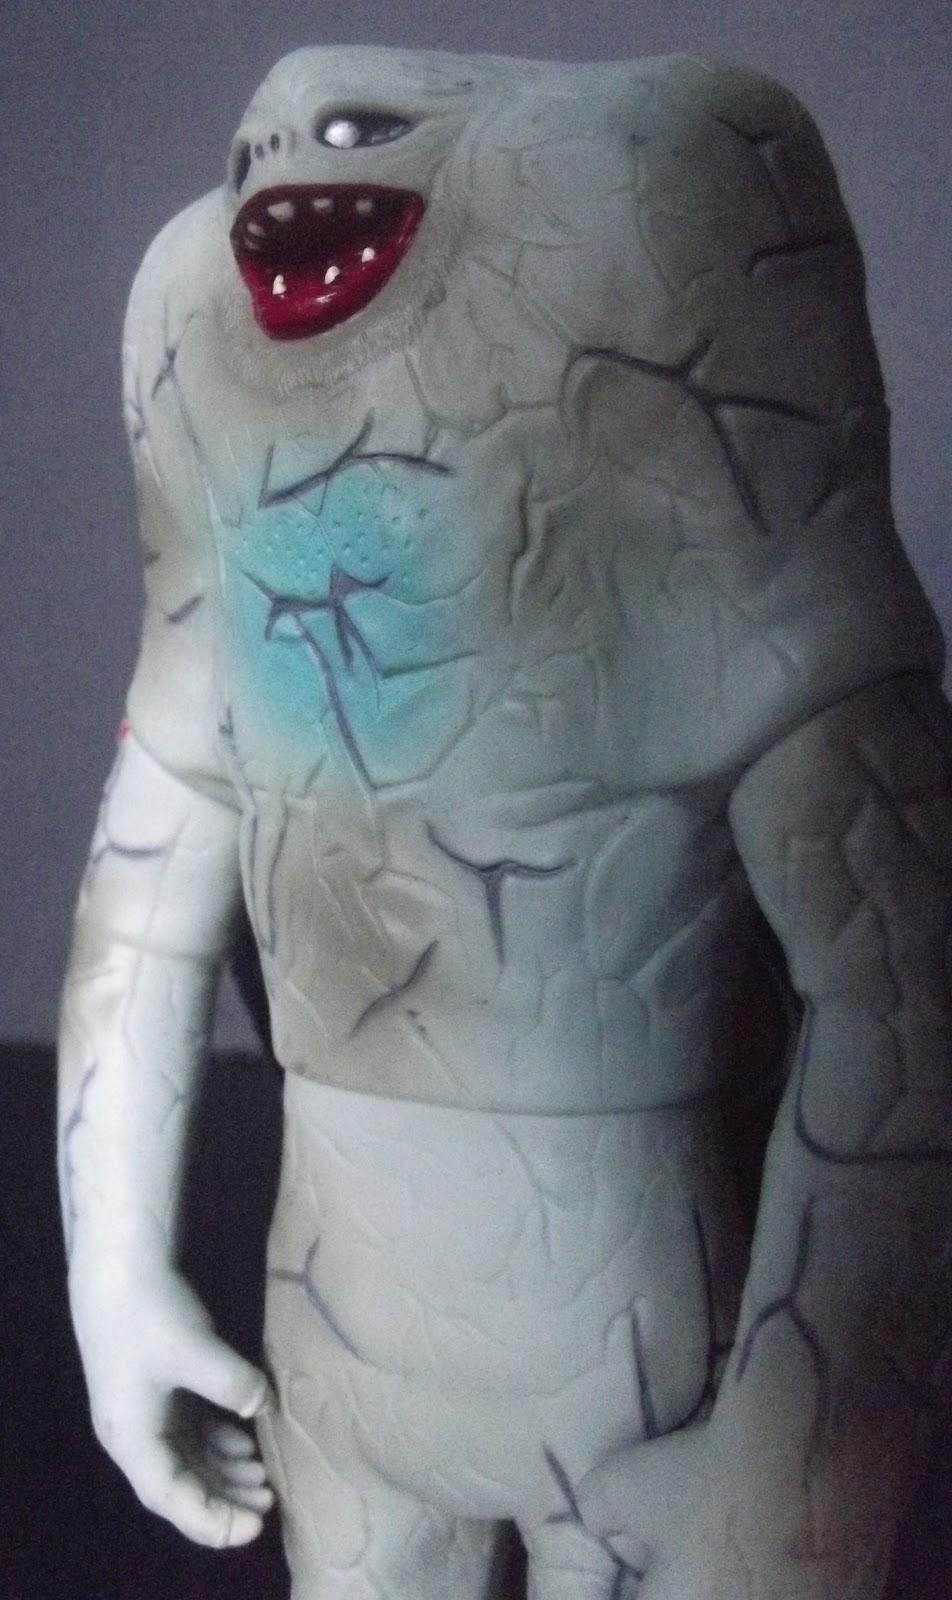 Raging Nerdgasm Ultraman S Jamila From Bandai